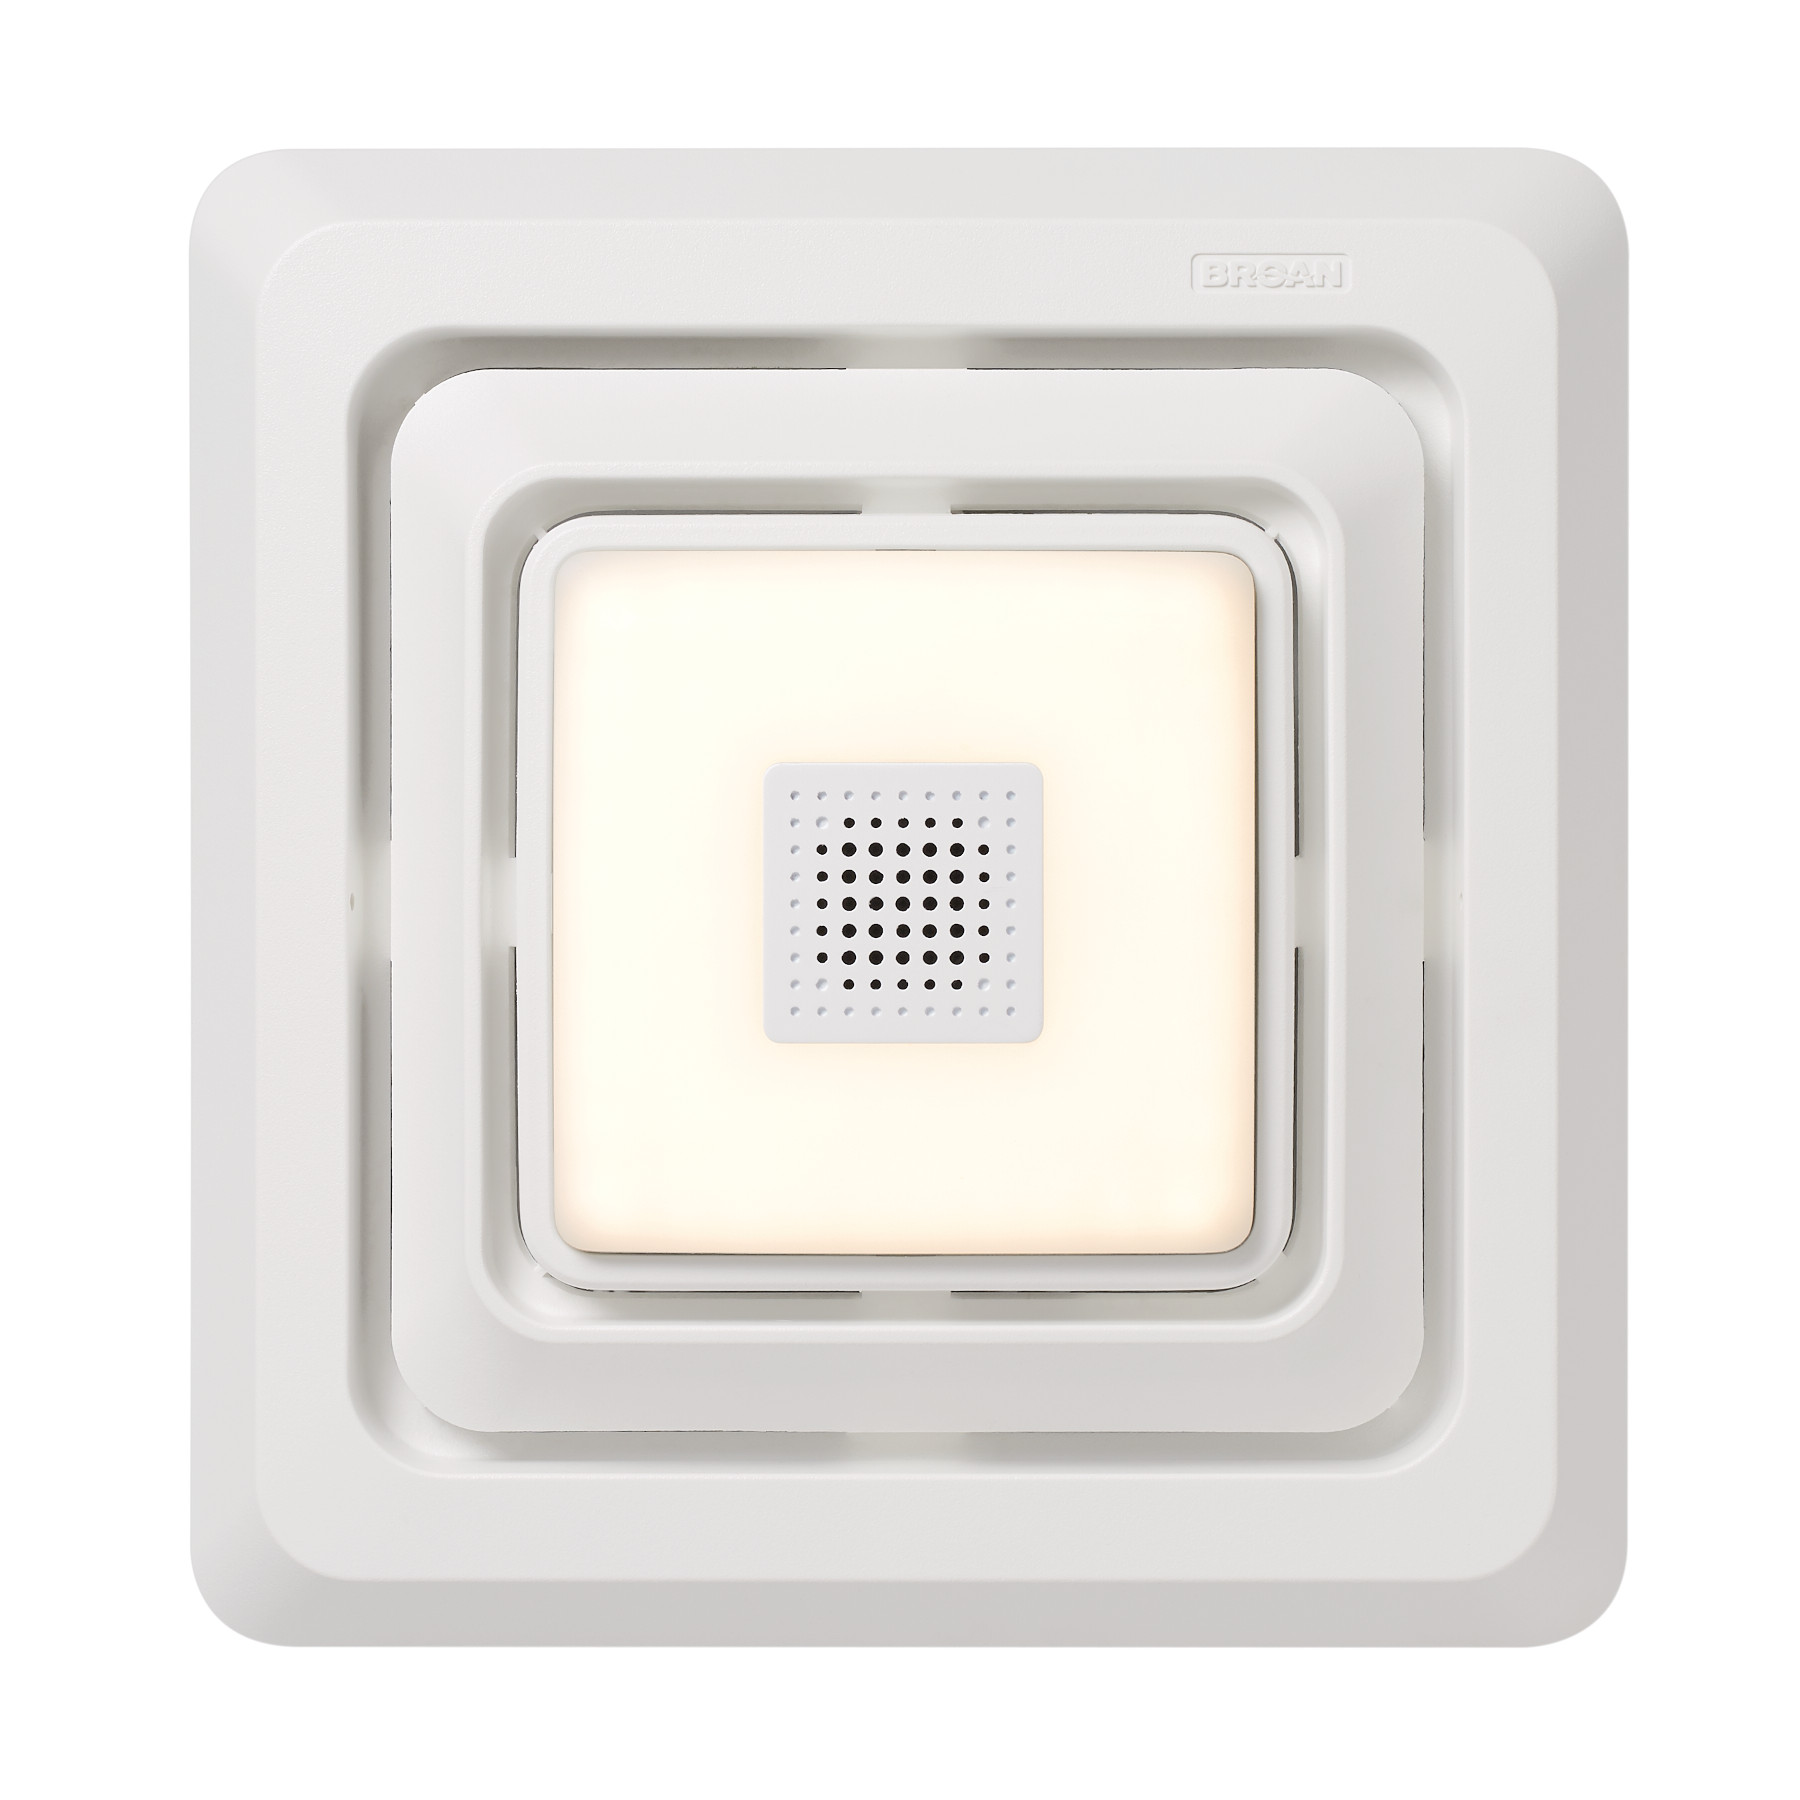 SPK80L Broan® Economy Series 80 CFM Bluetooth Ventilation ...